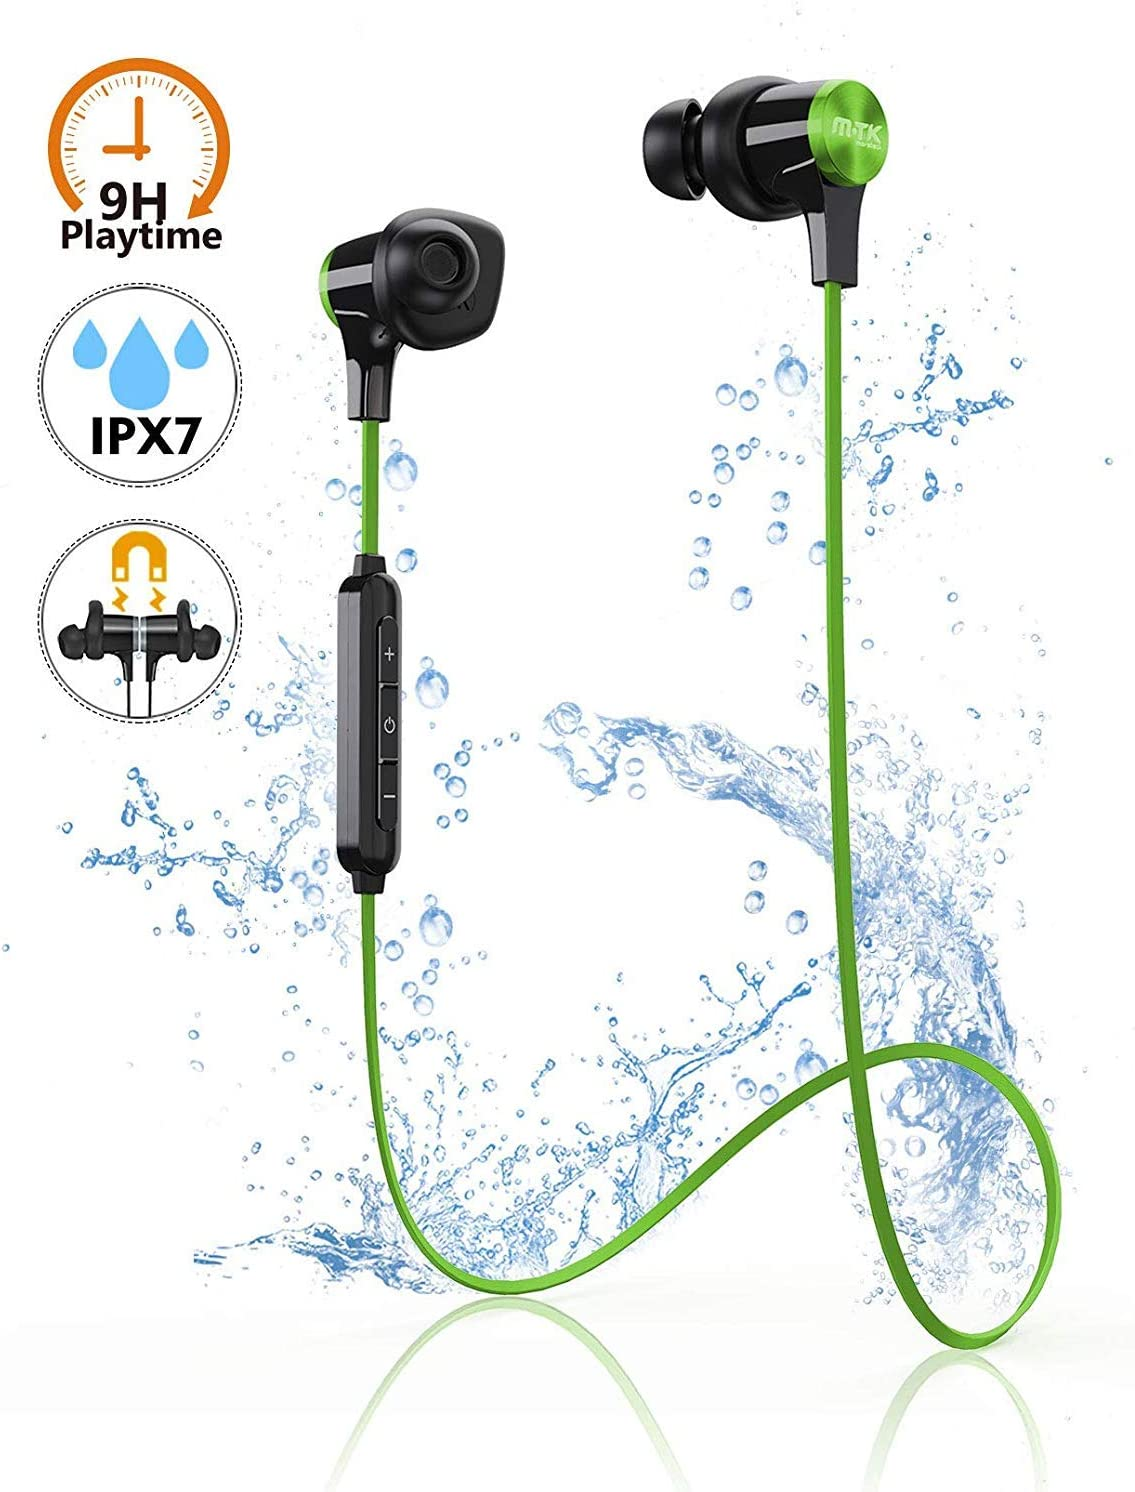 Auriculares Bluetooth, Auriculares inalámbricos con imán, M-T-K Bluetooth 5.0 Auriculares Deportivos con aptX HD Audio 8H Playtime IPX7 Impermeable CVC 8.0 para Correr